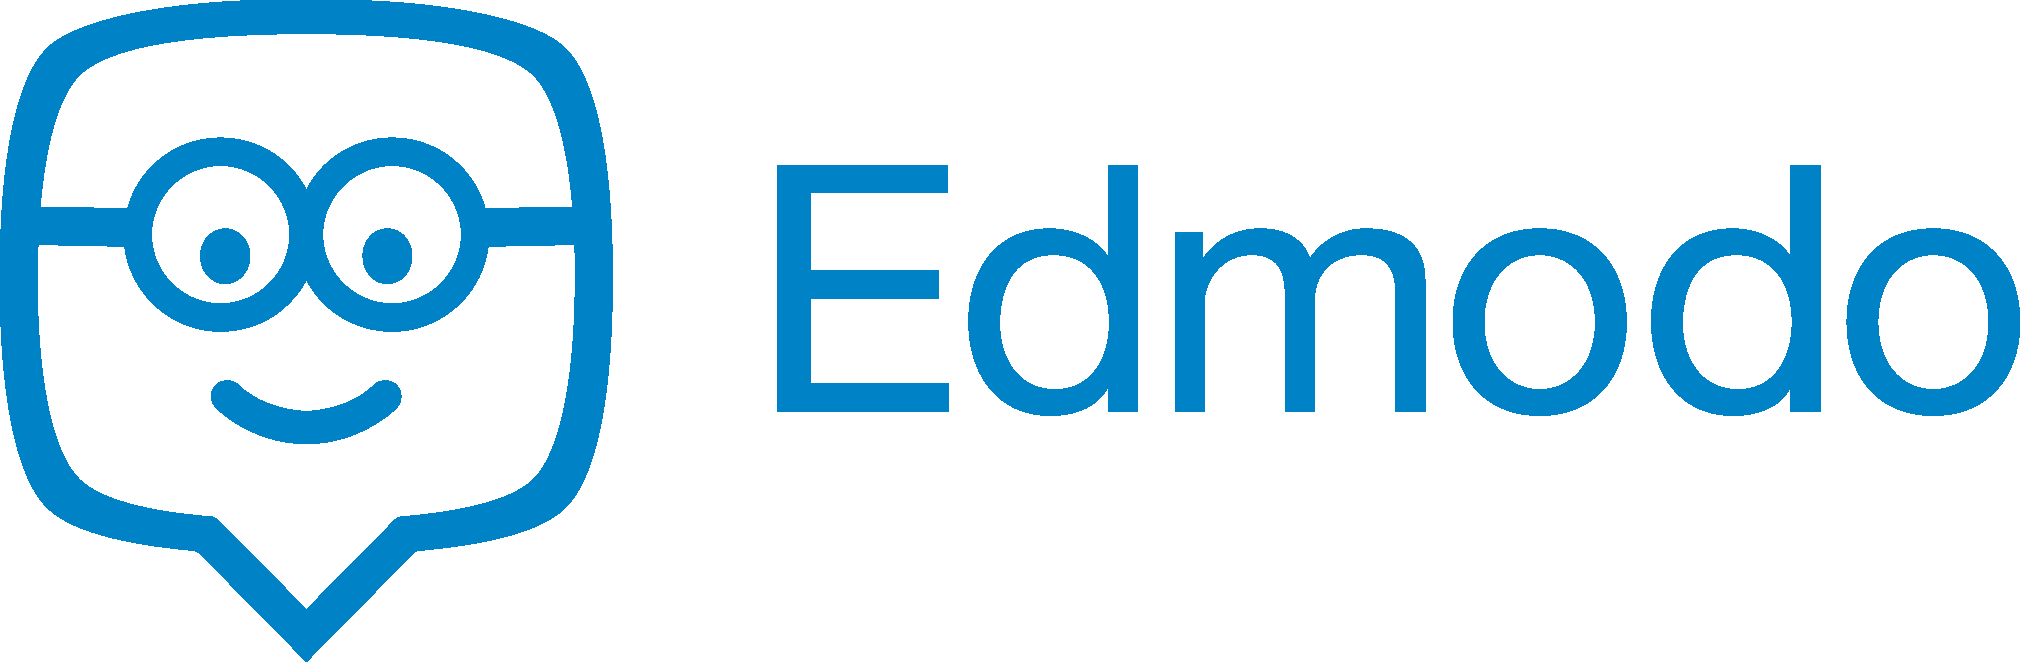 Edmodo Logo Download Vector.